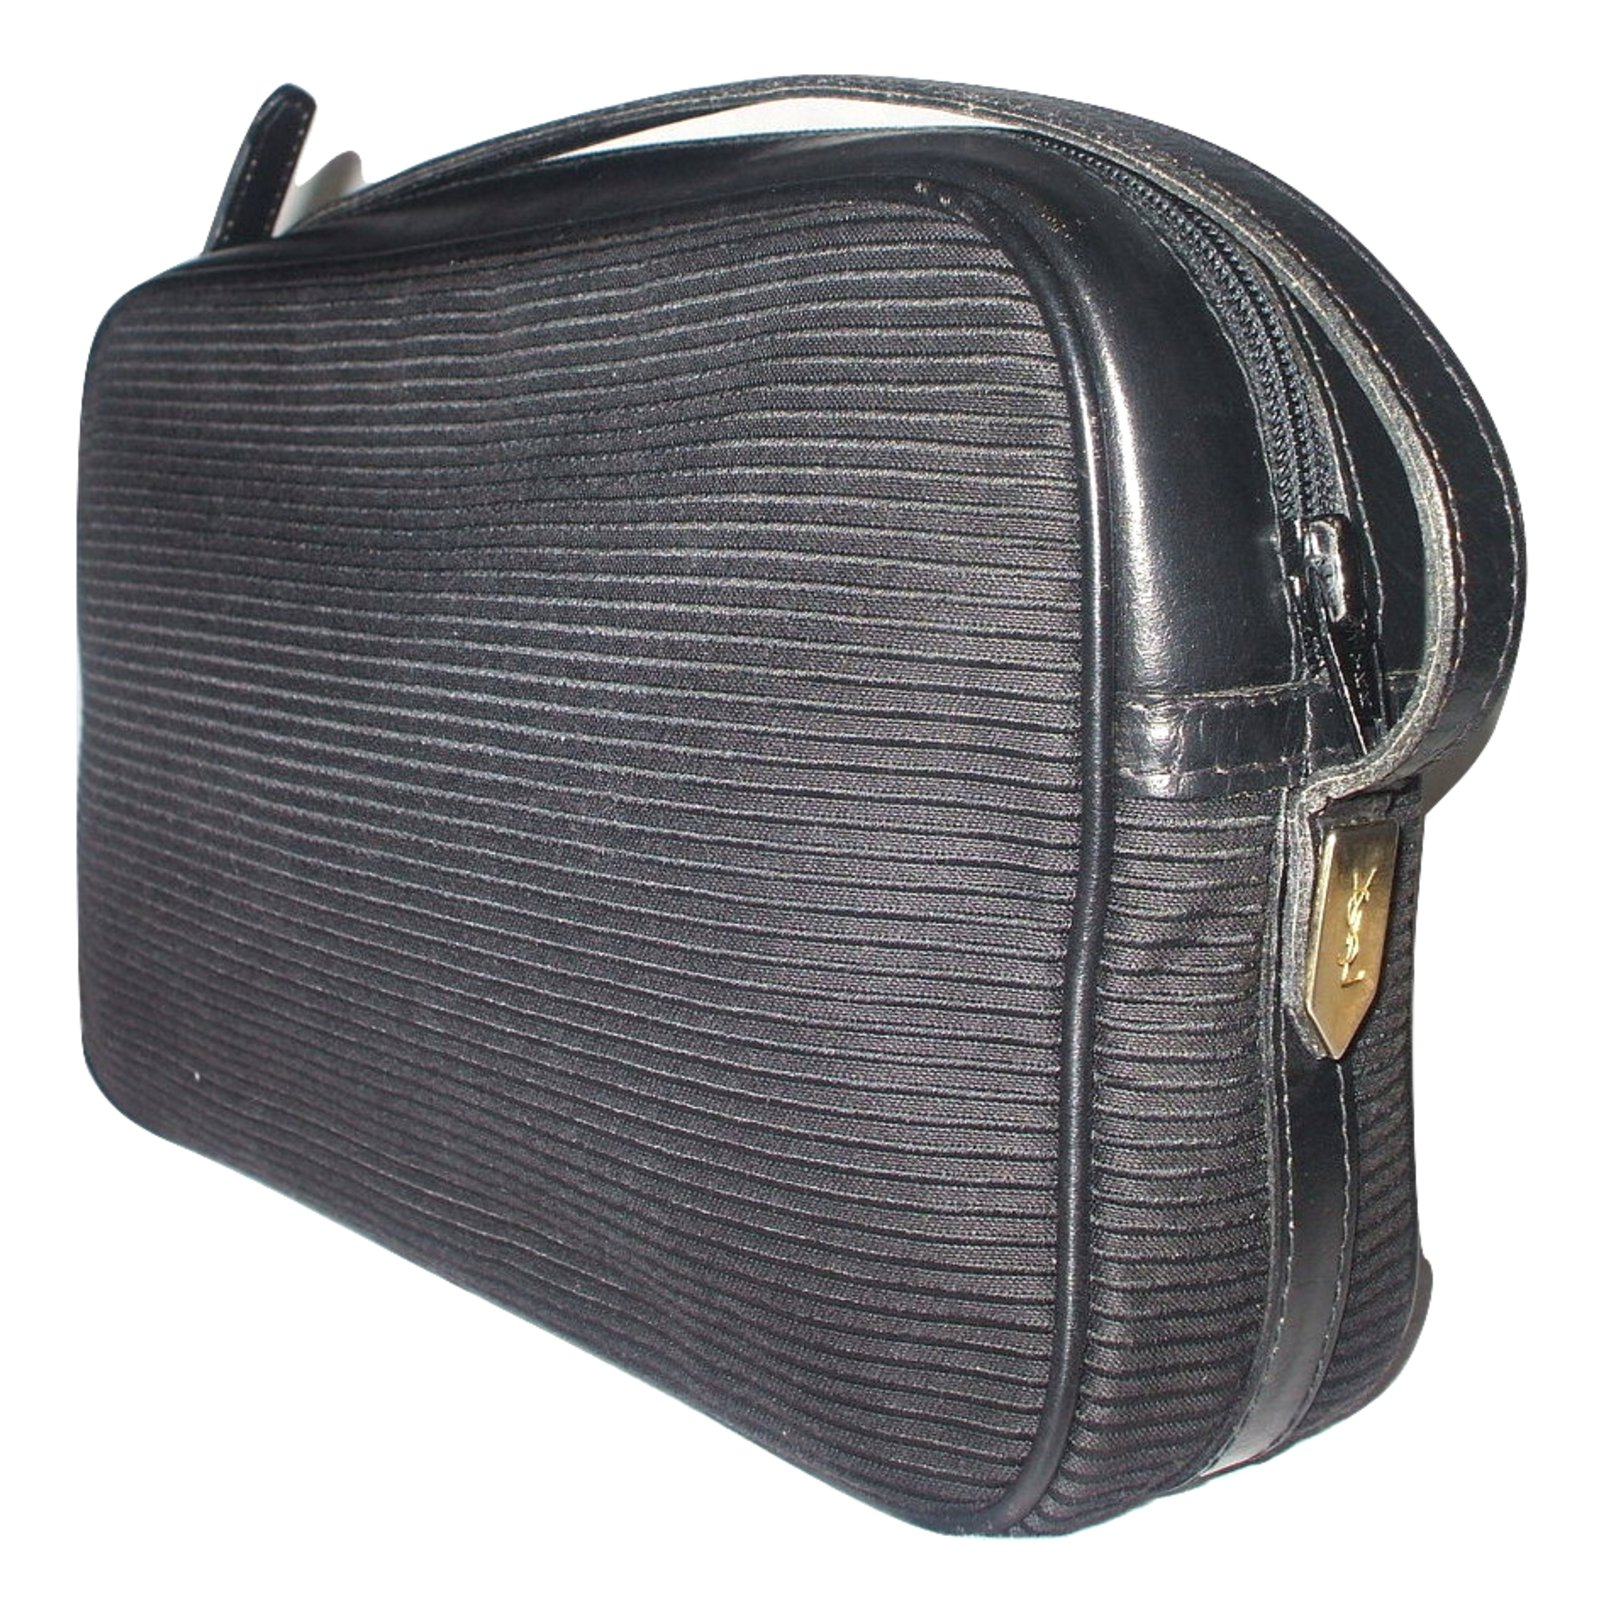 Yves Saint Laurent Handbags Handbags Cloth Black ref.15413 - Joli Closet f963d5b92f